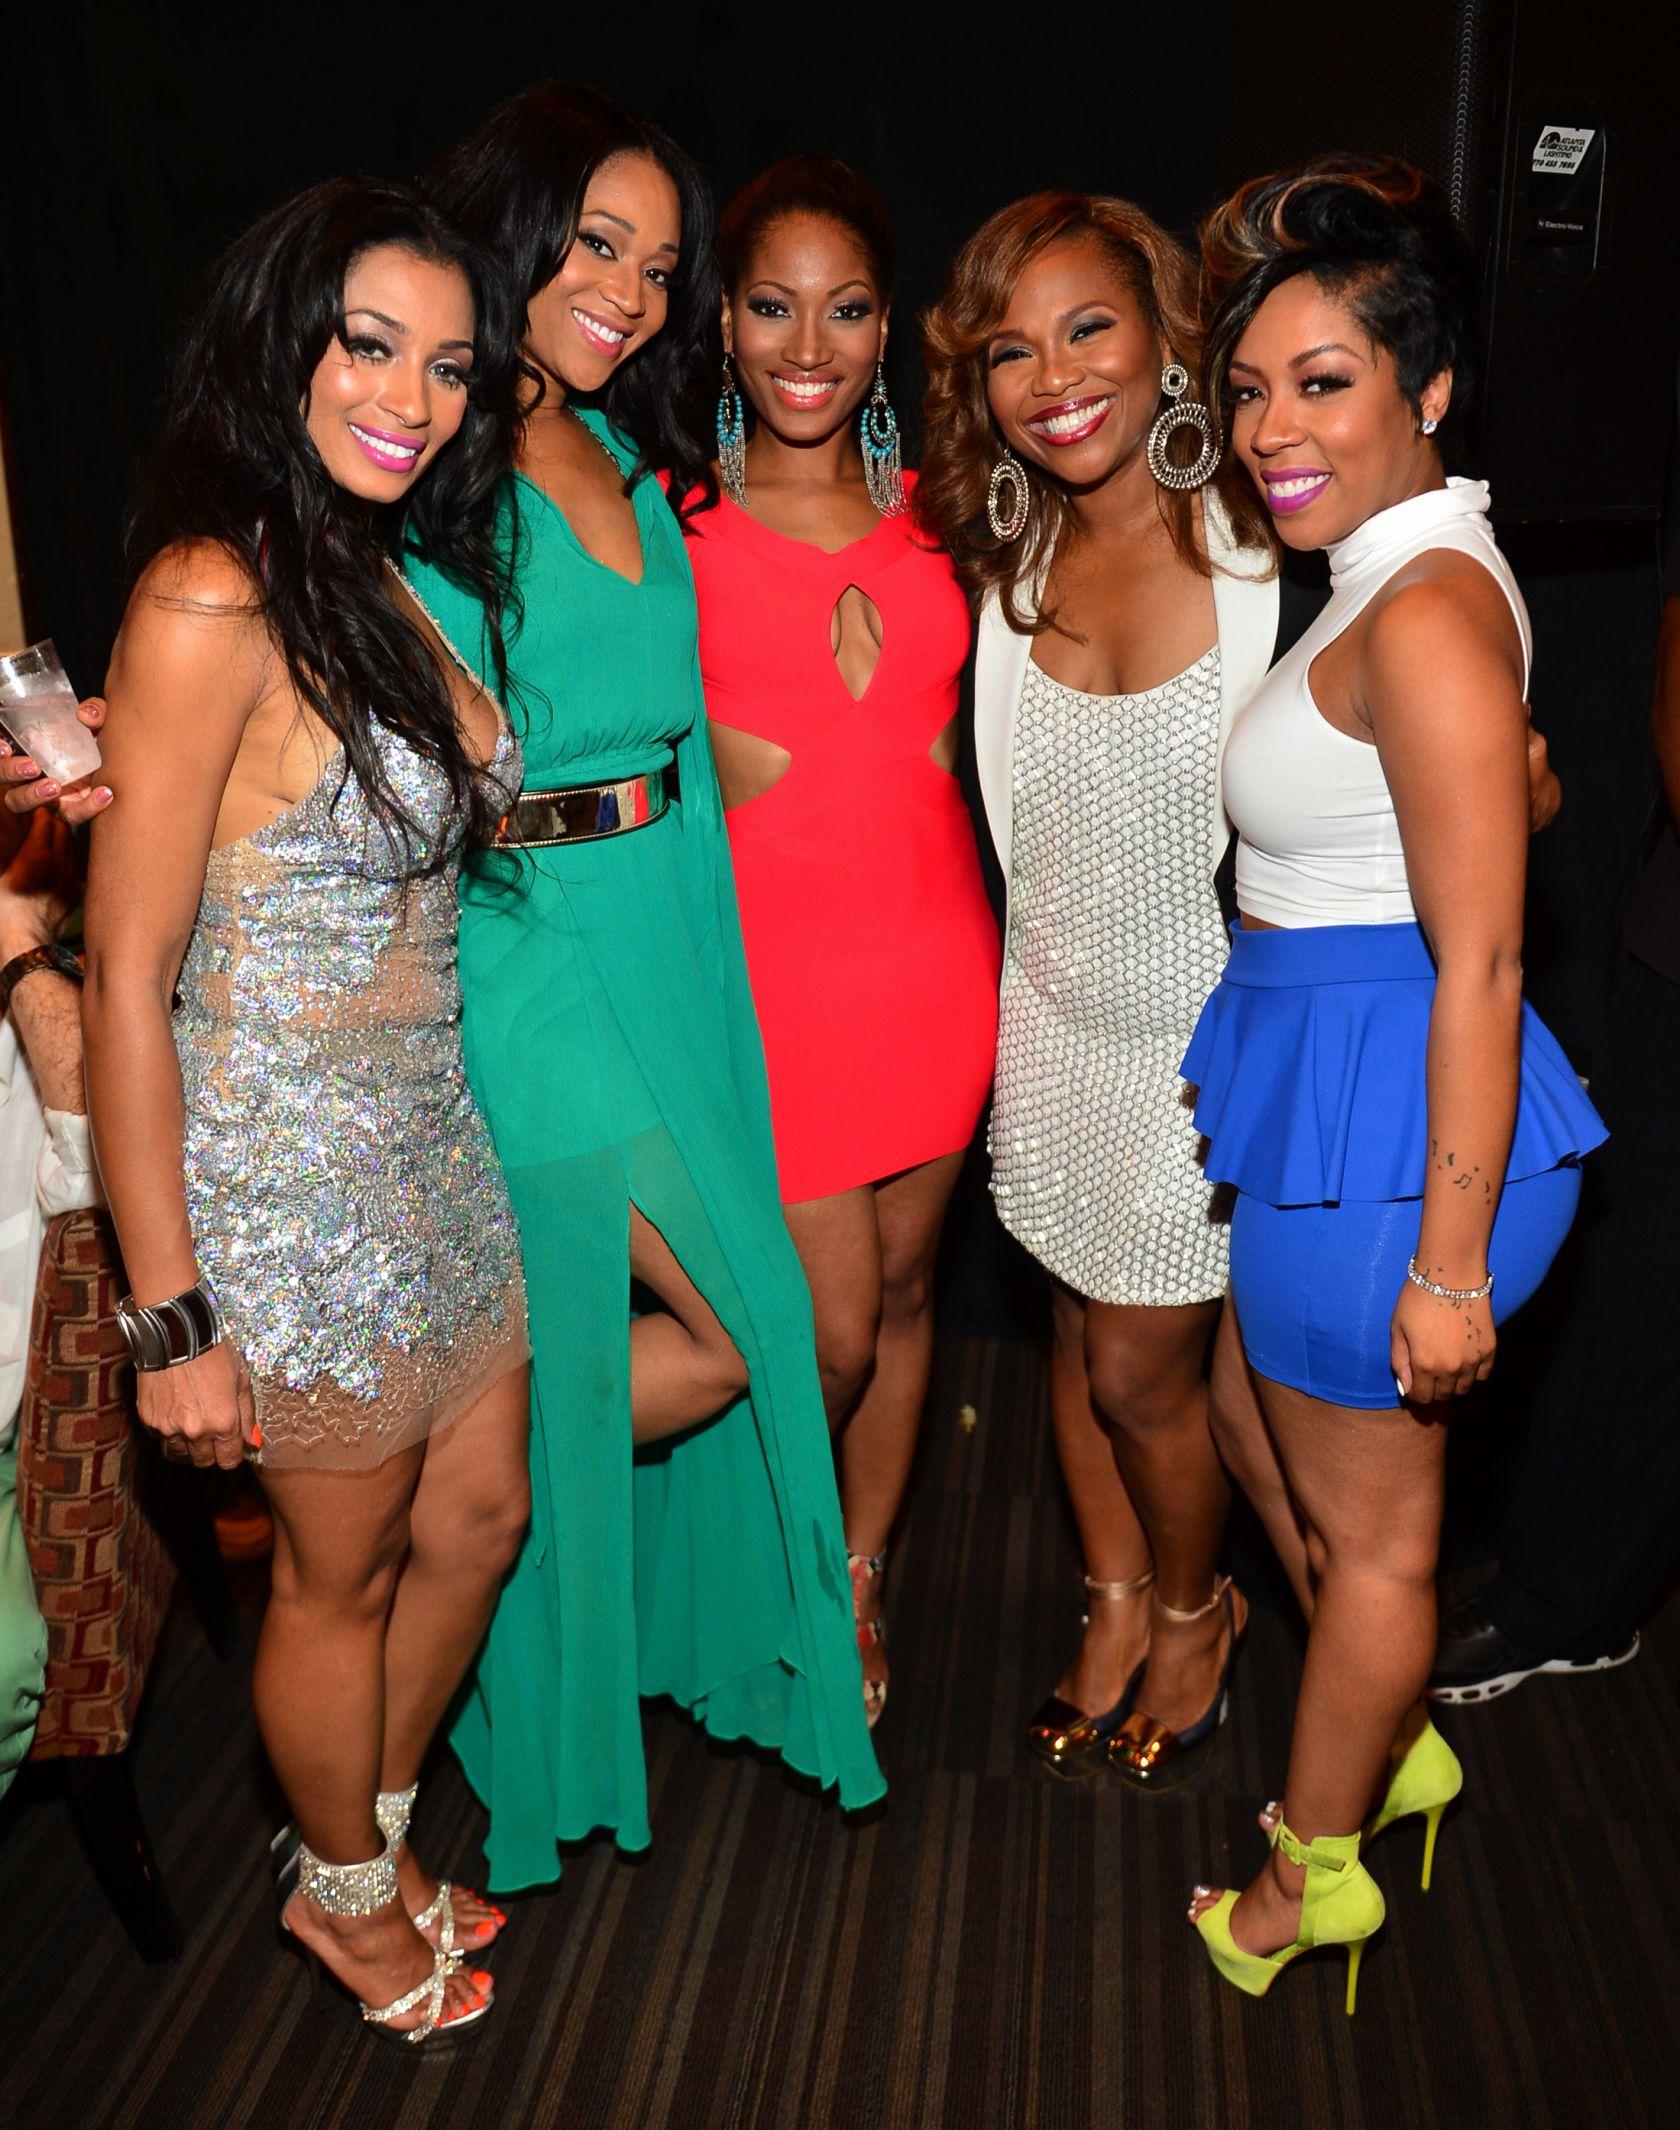 VH1 'Love And Hip Hop Atlanta' Premiere Party